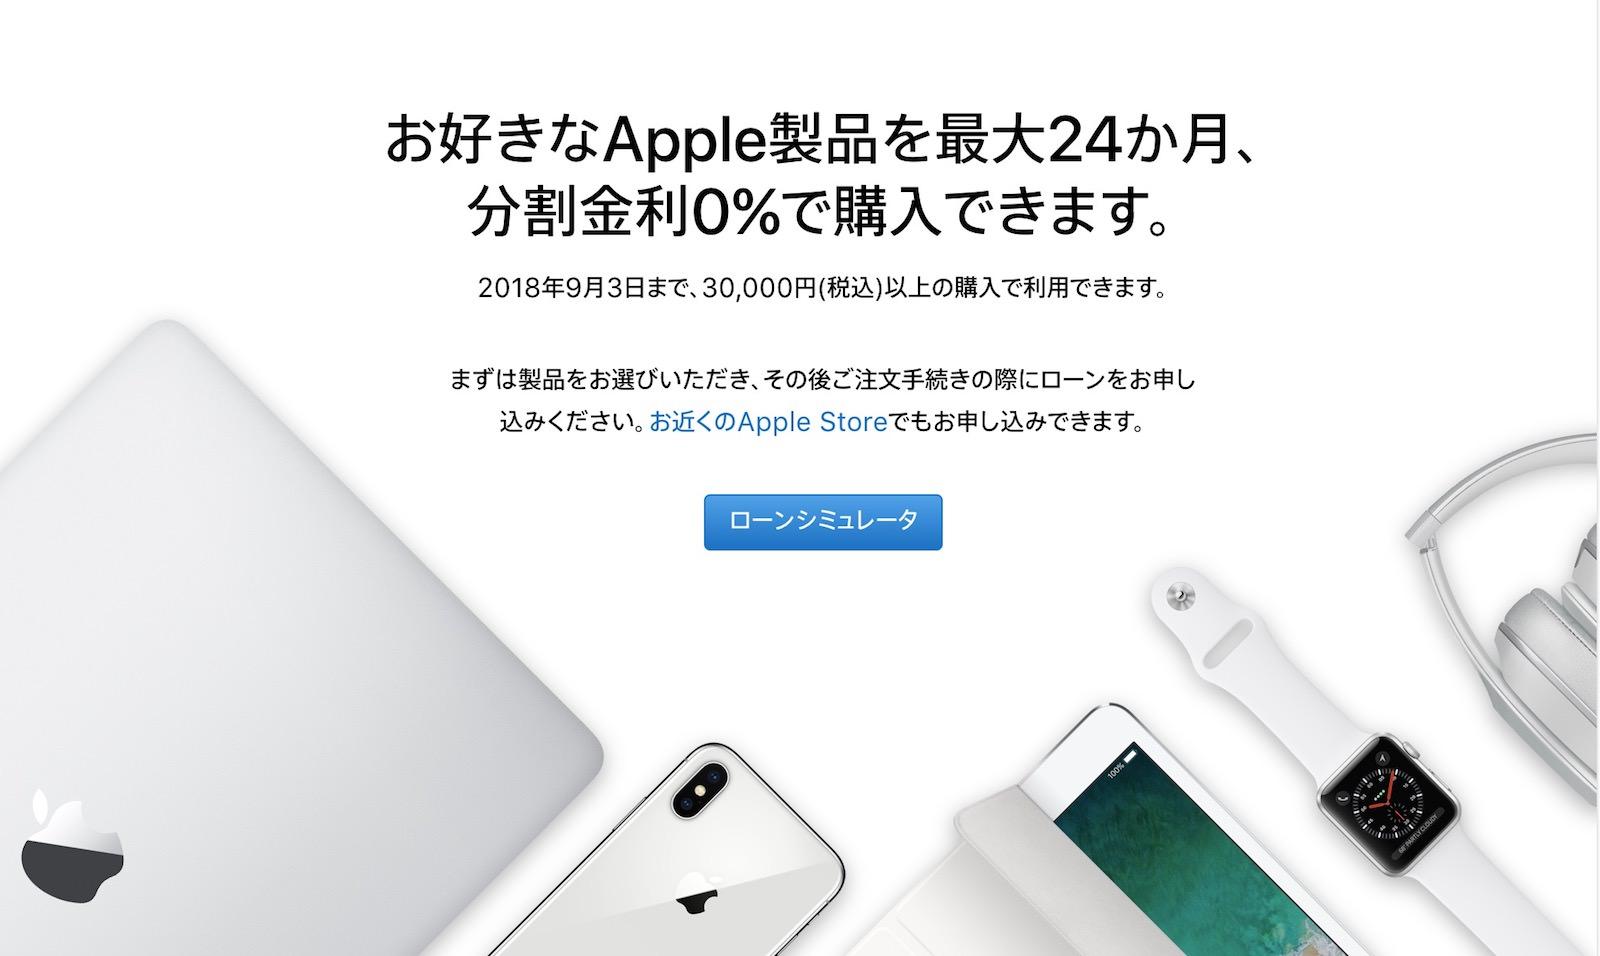 Apple financing 20180701